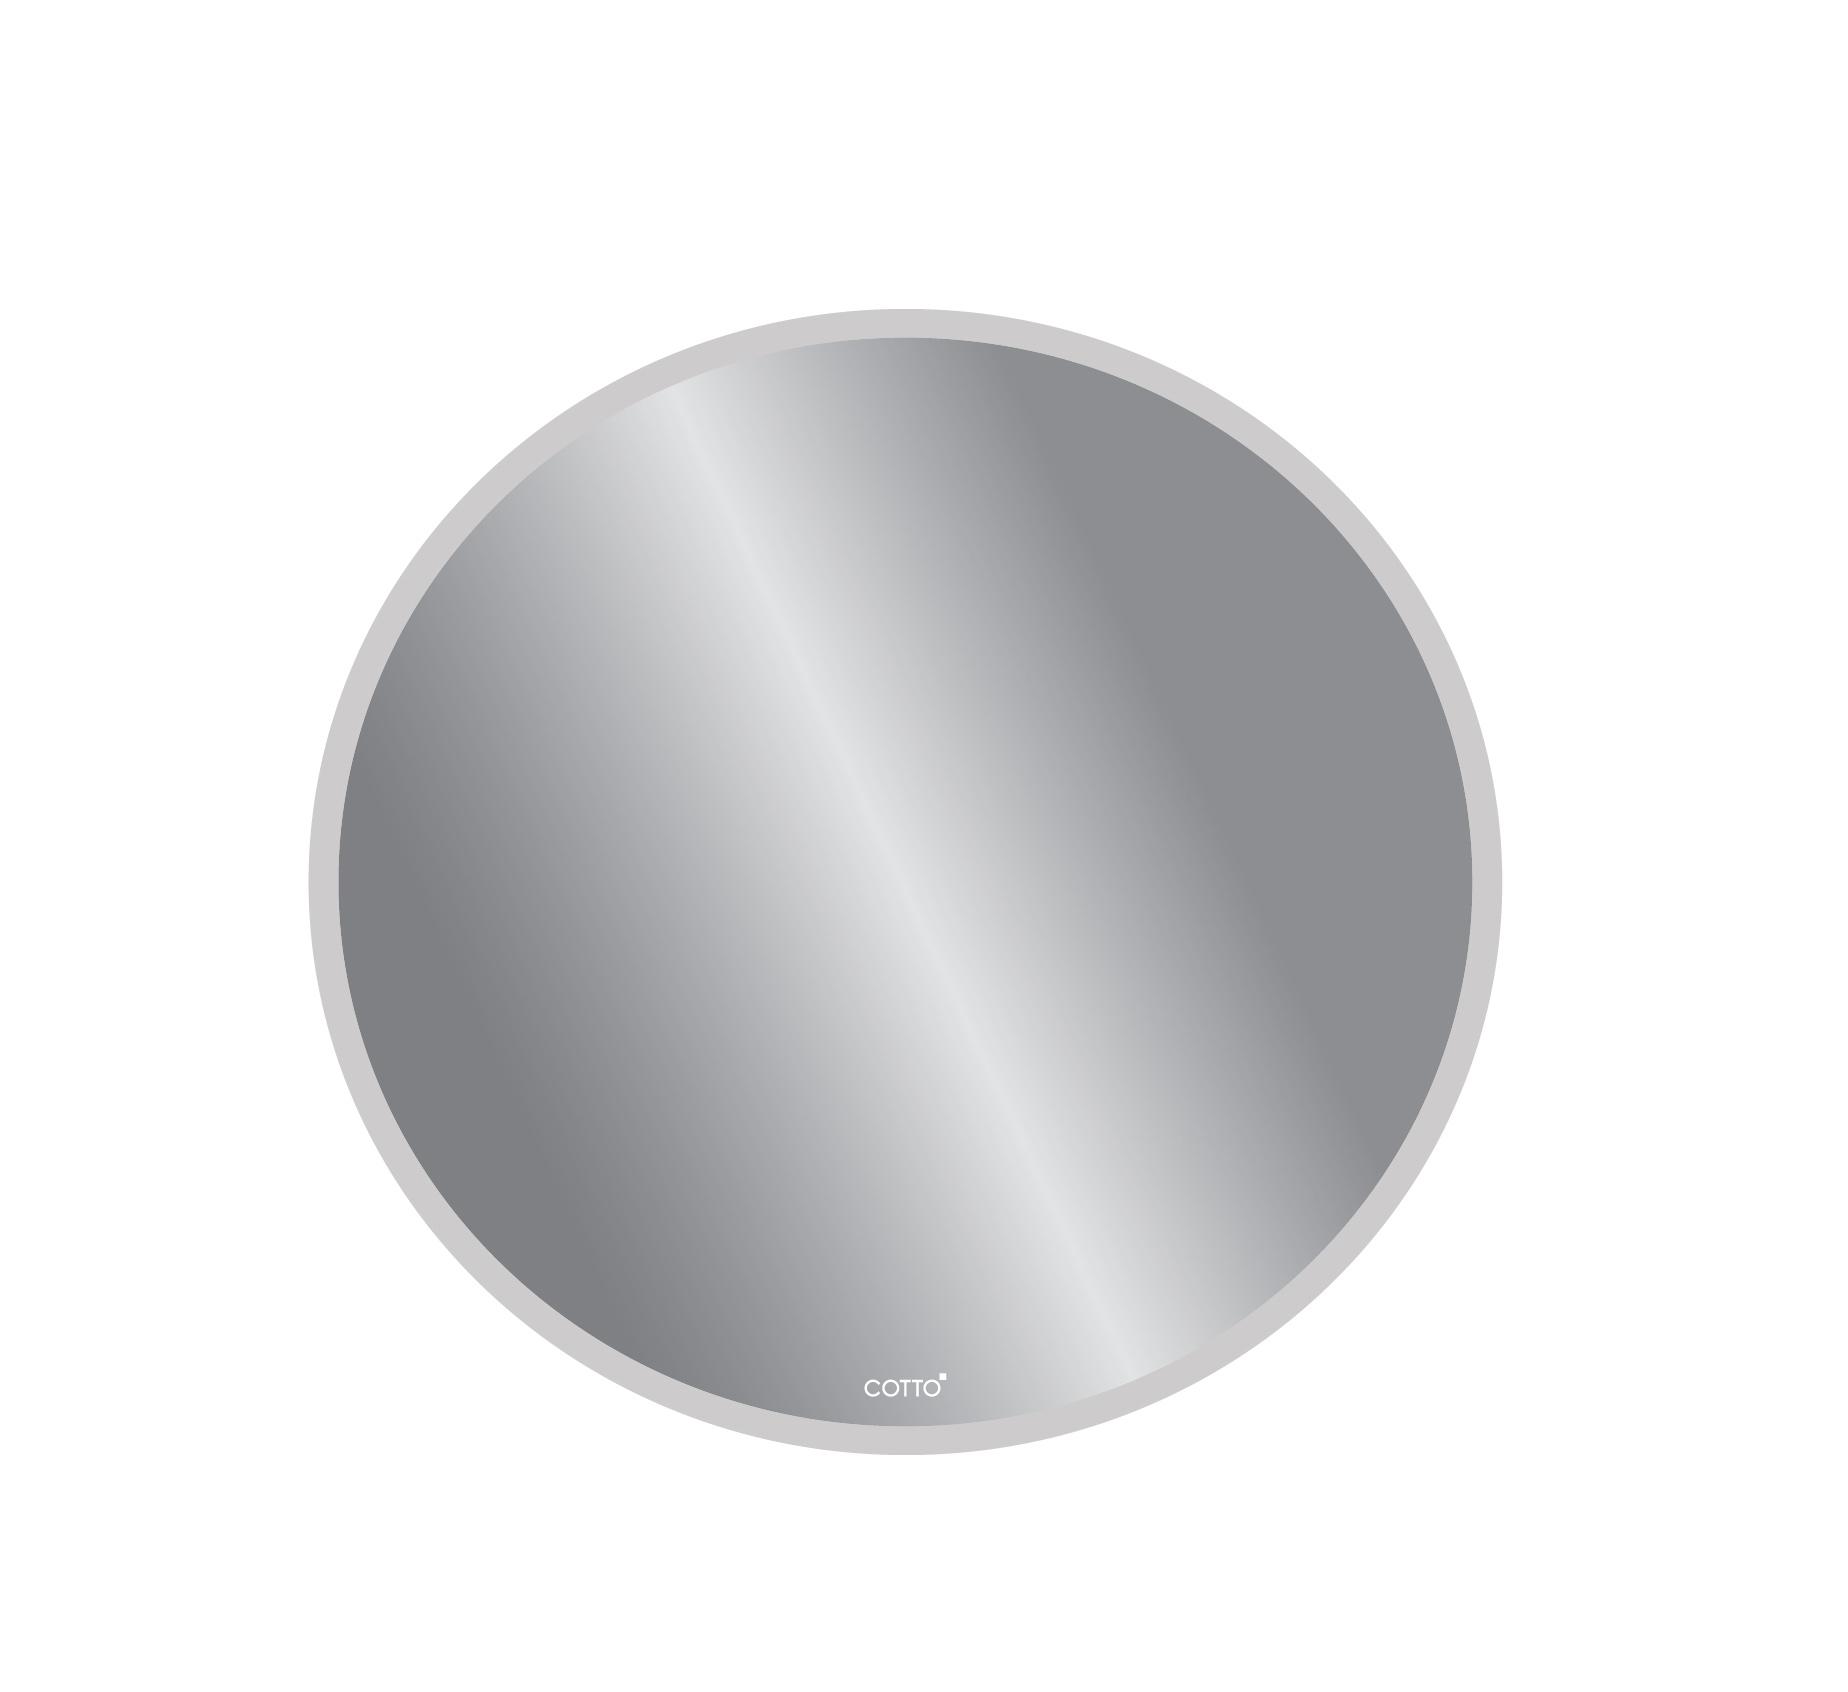 COTTO MIRROR MY REDIUS 600 MM. - MR600